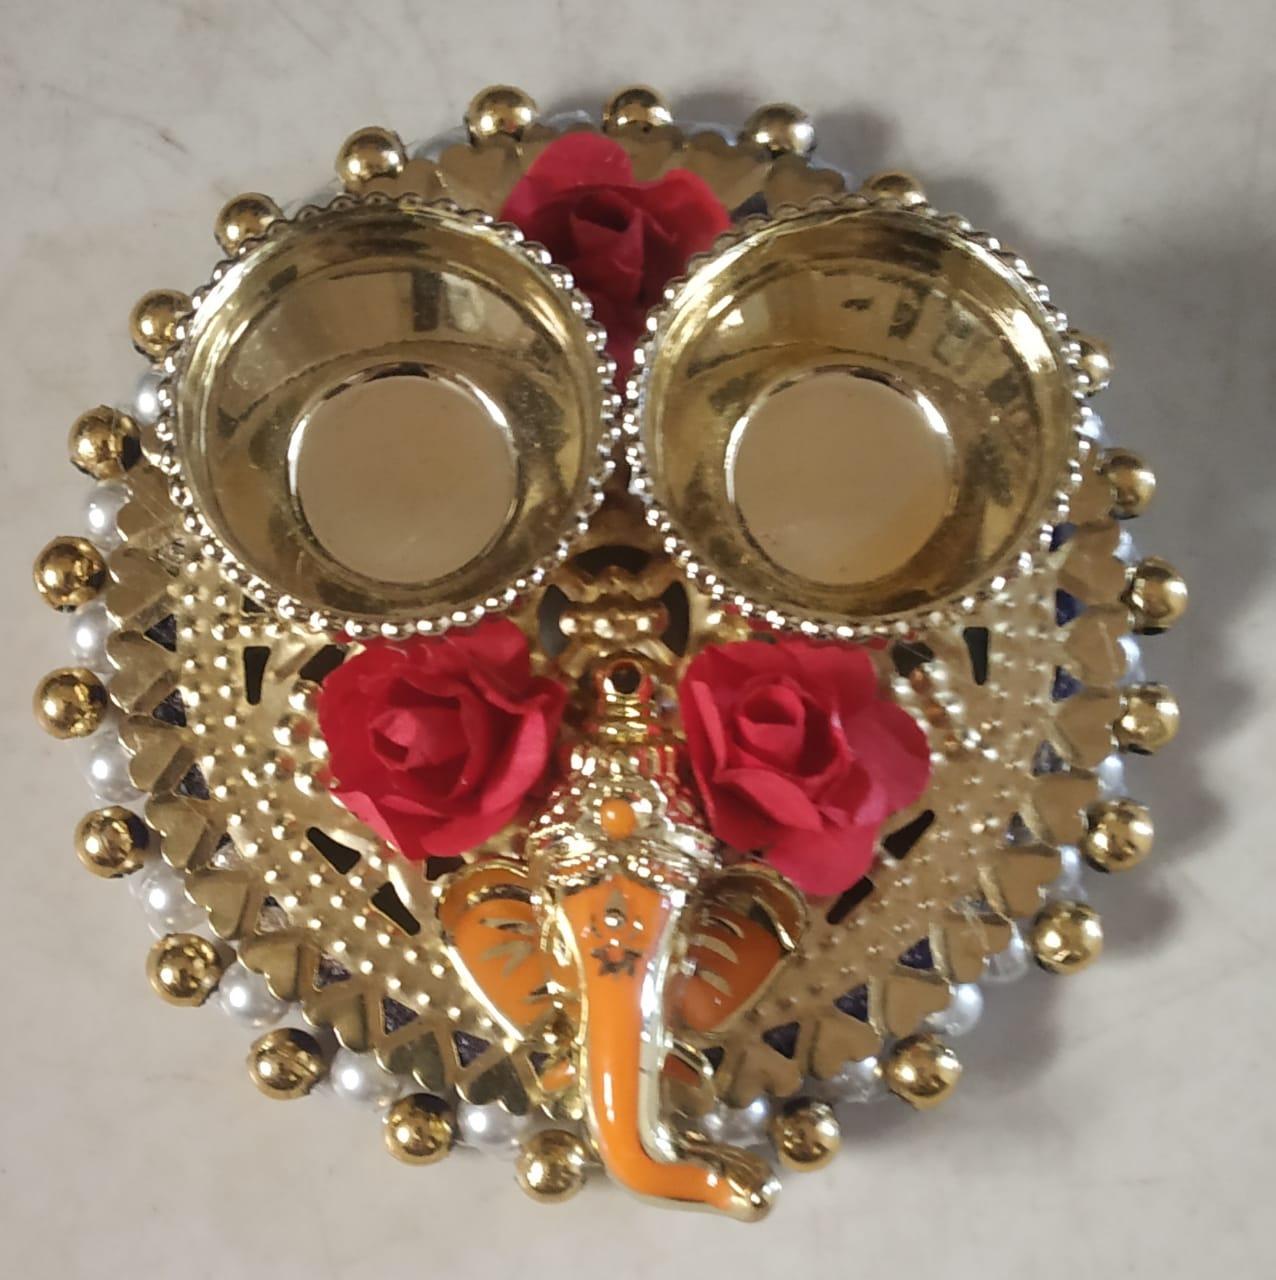 Puja Kankavati with Lord Ganesha (Roli & Chawal Platter) Slider Thumbnail 1/2